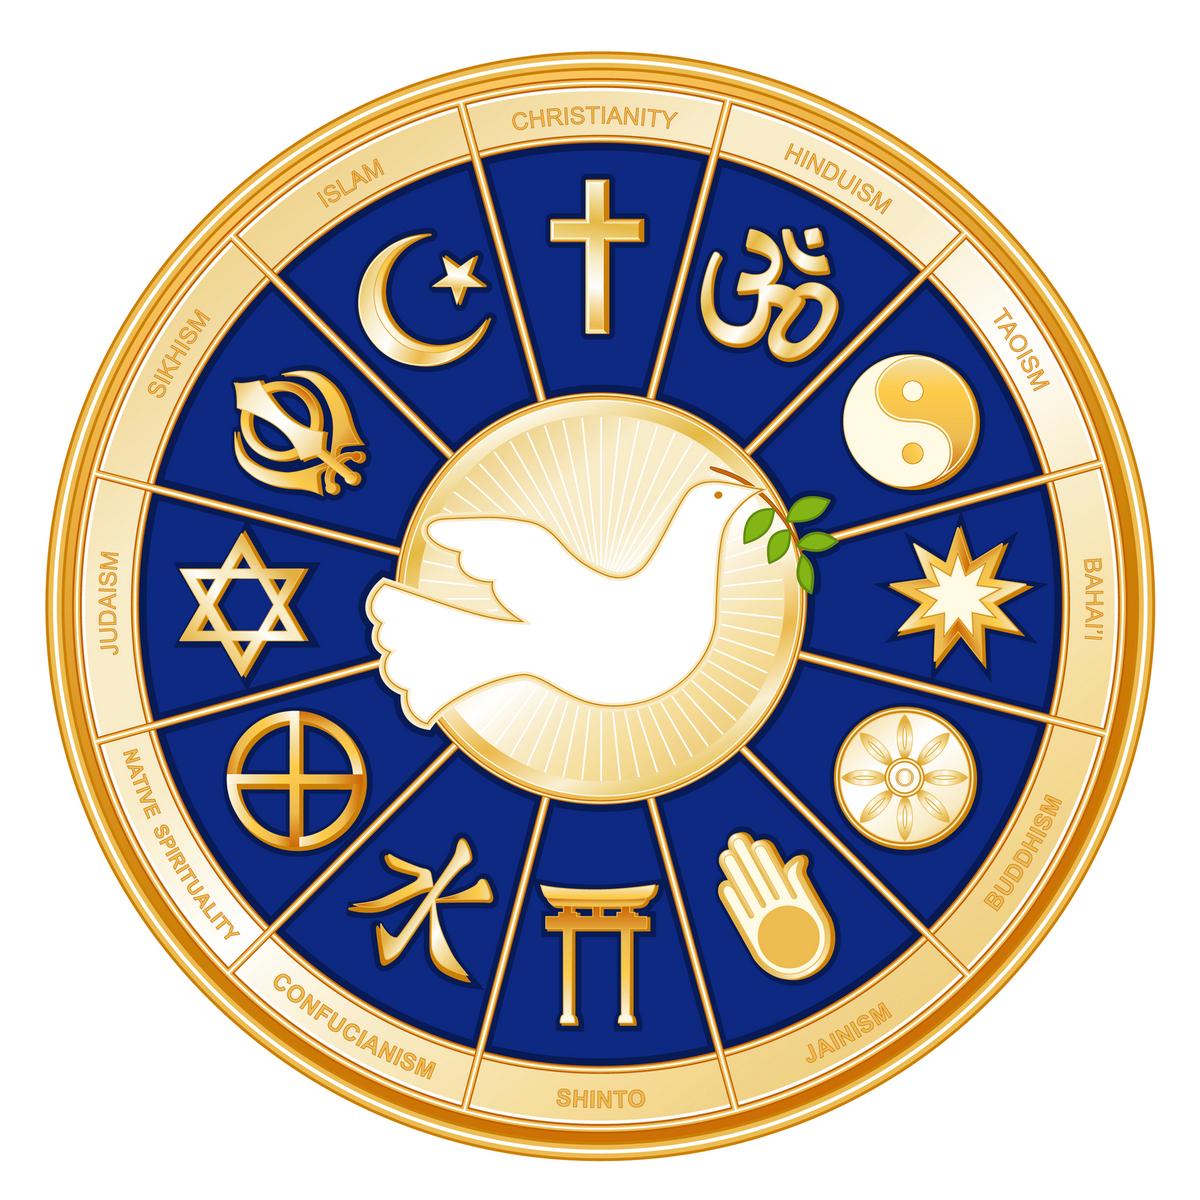 interfaithsymbols